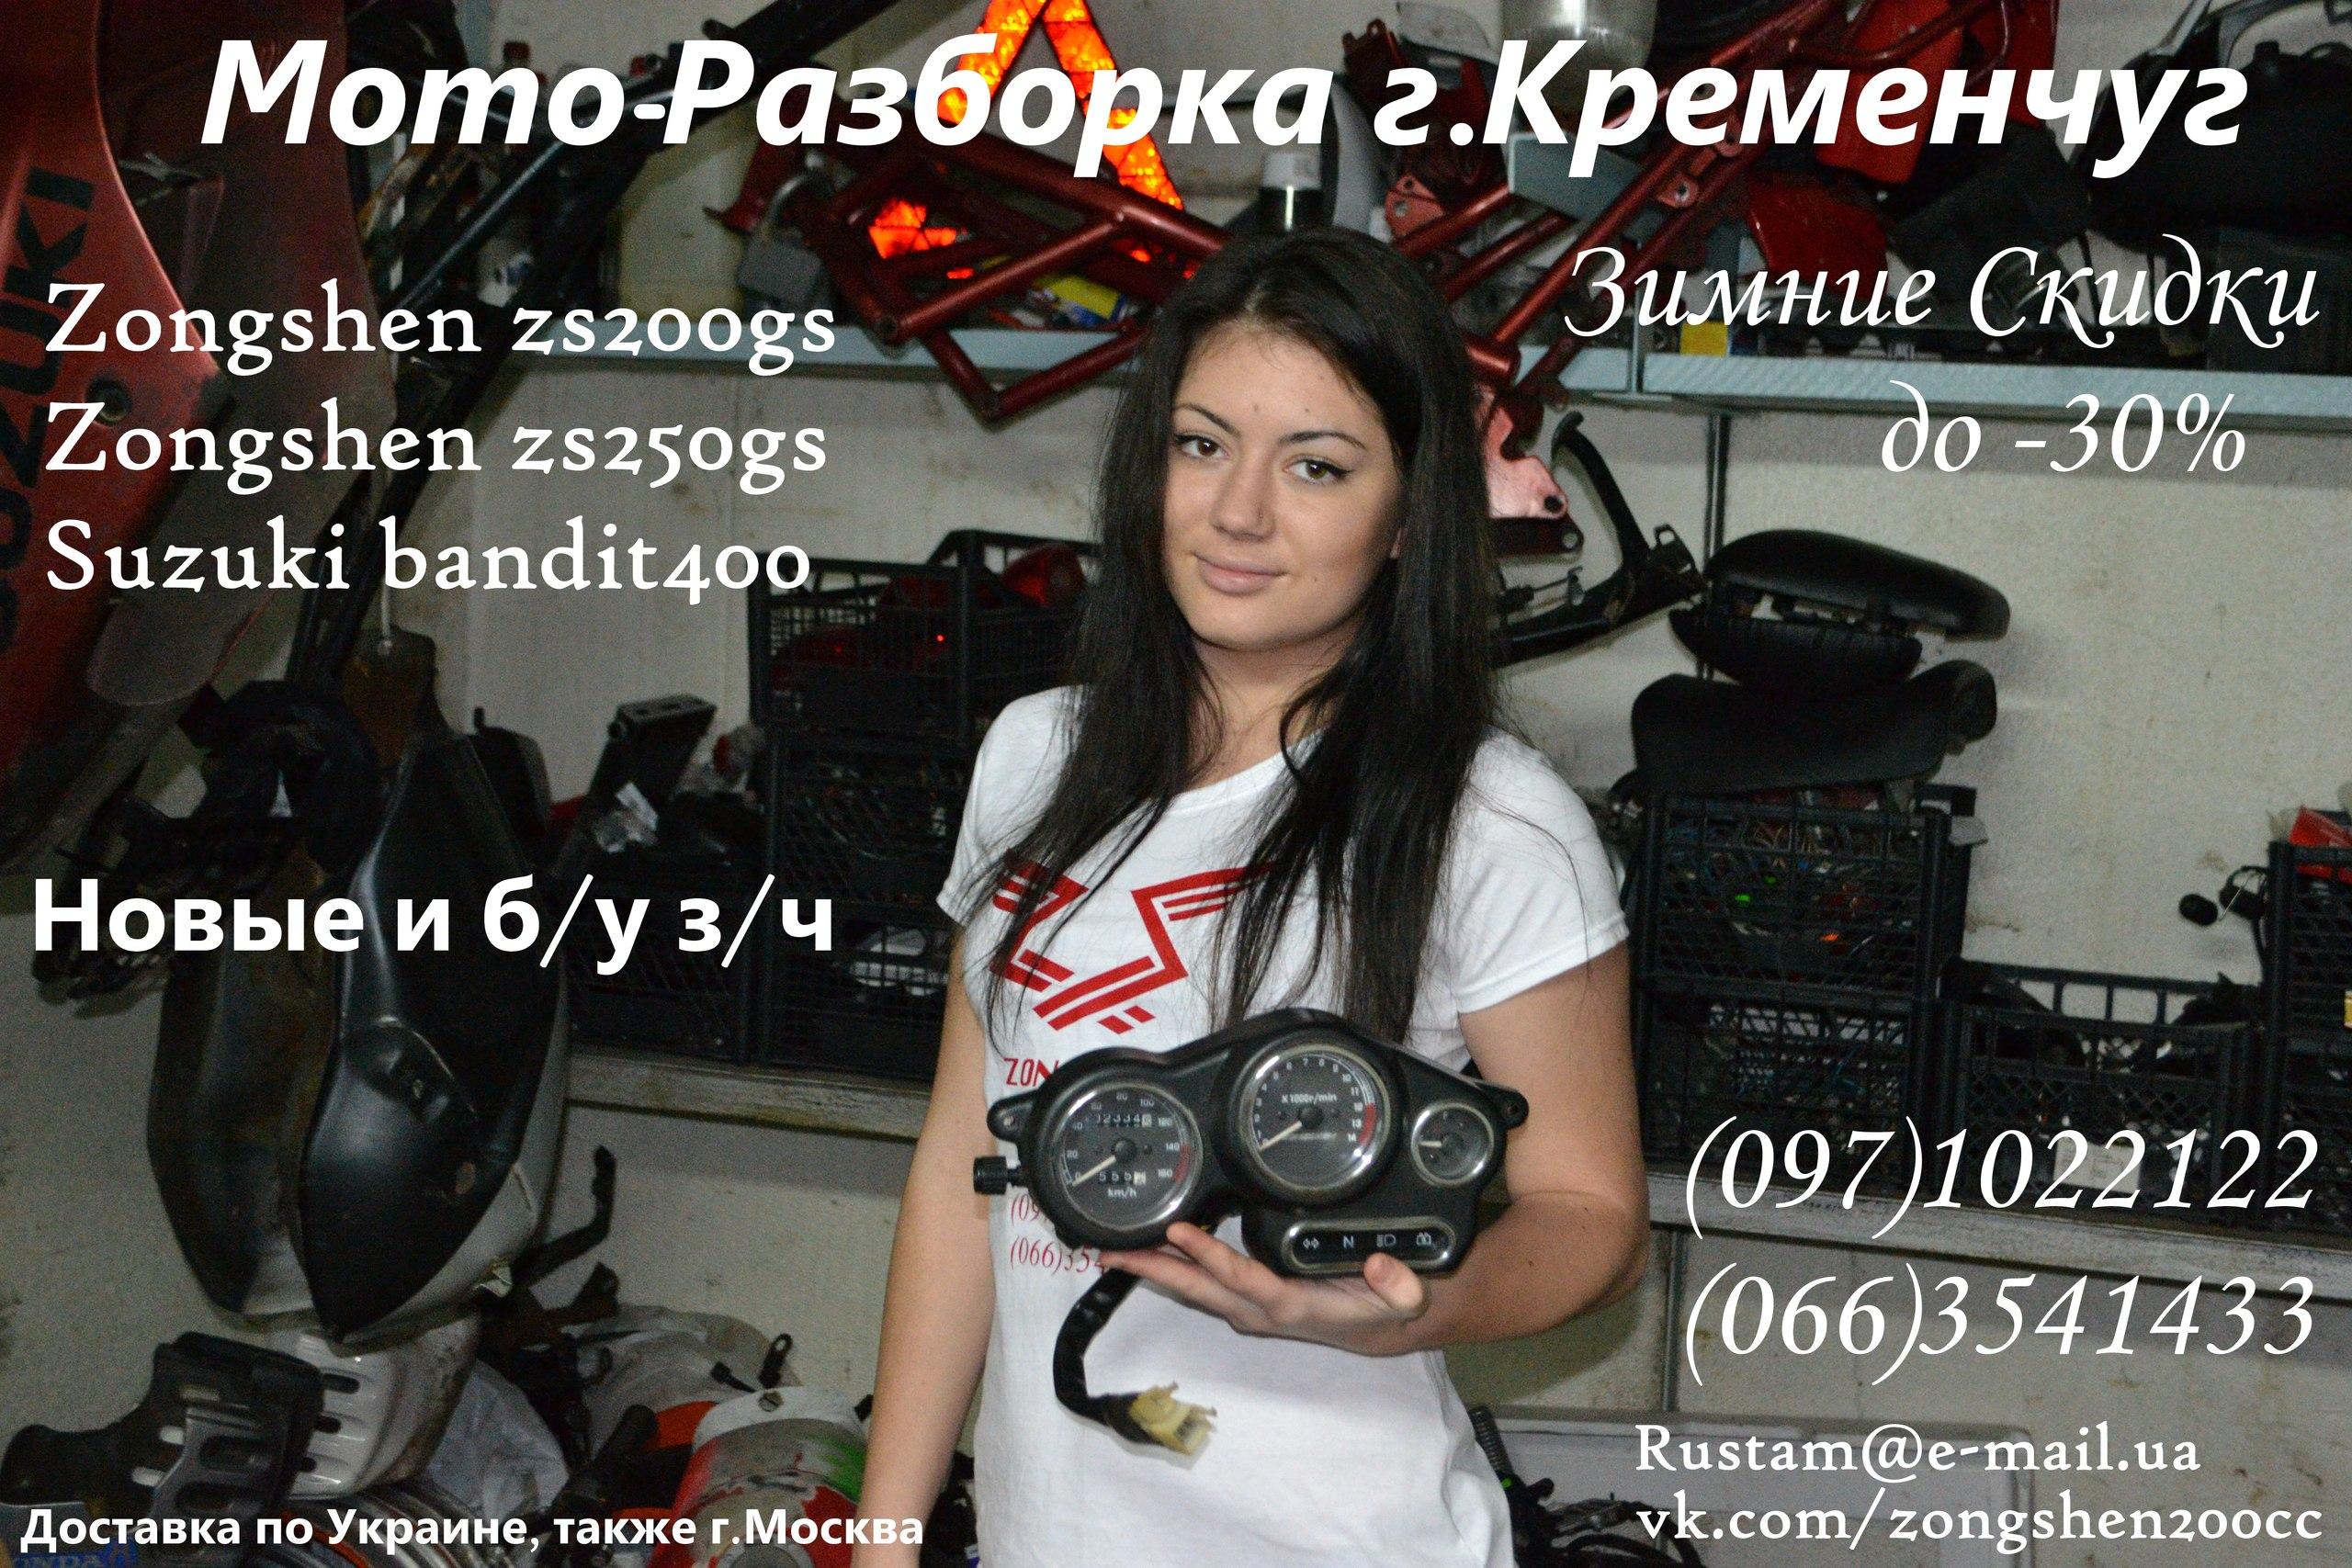 Разборка Zongshen 200GS-250GS Запчасти б/у и Новые!!!! Зонгшен - Страница 3 1NrhFPyuAfs